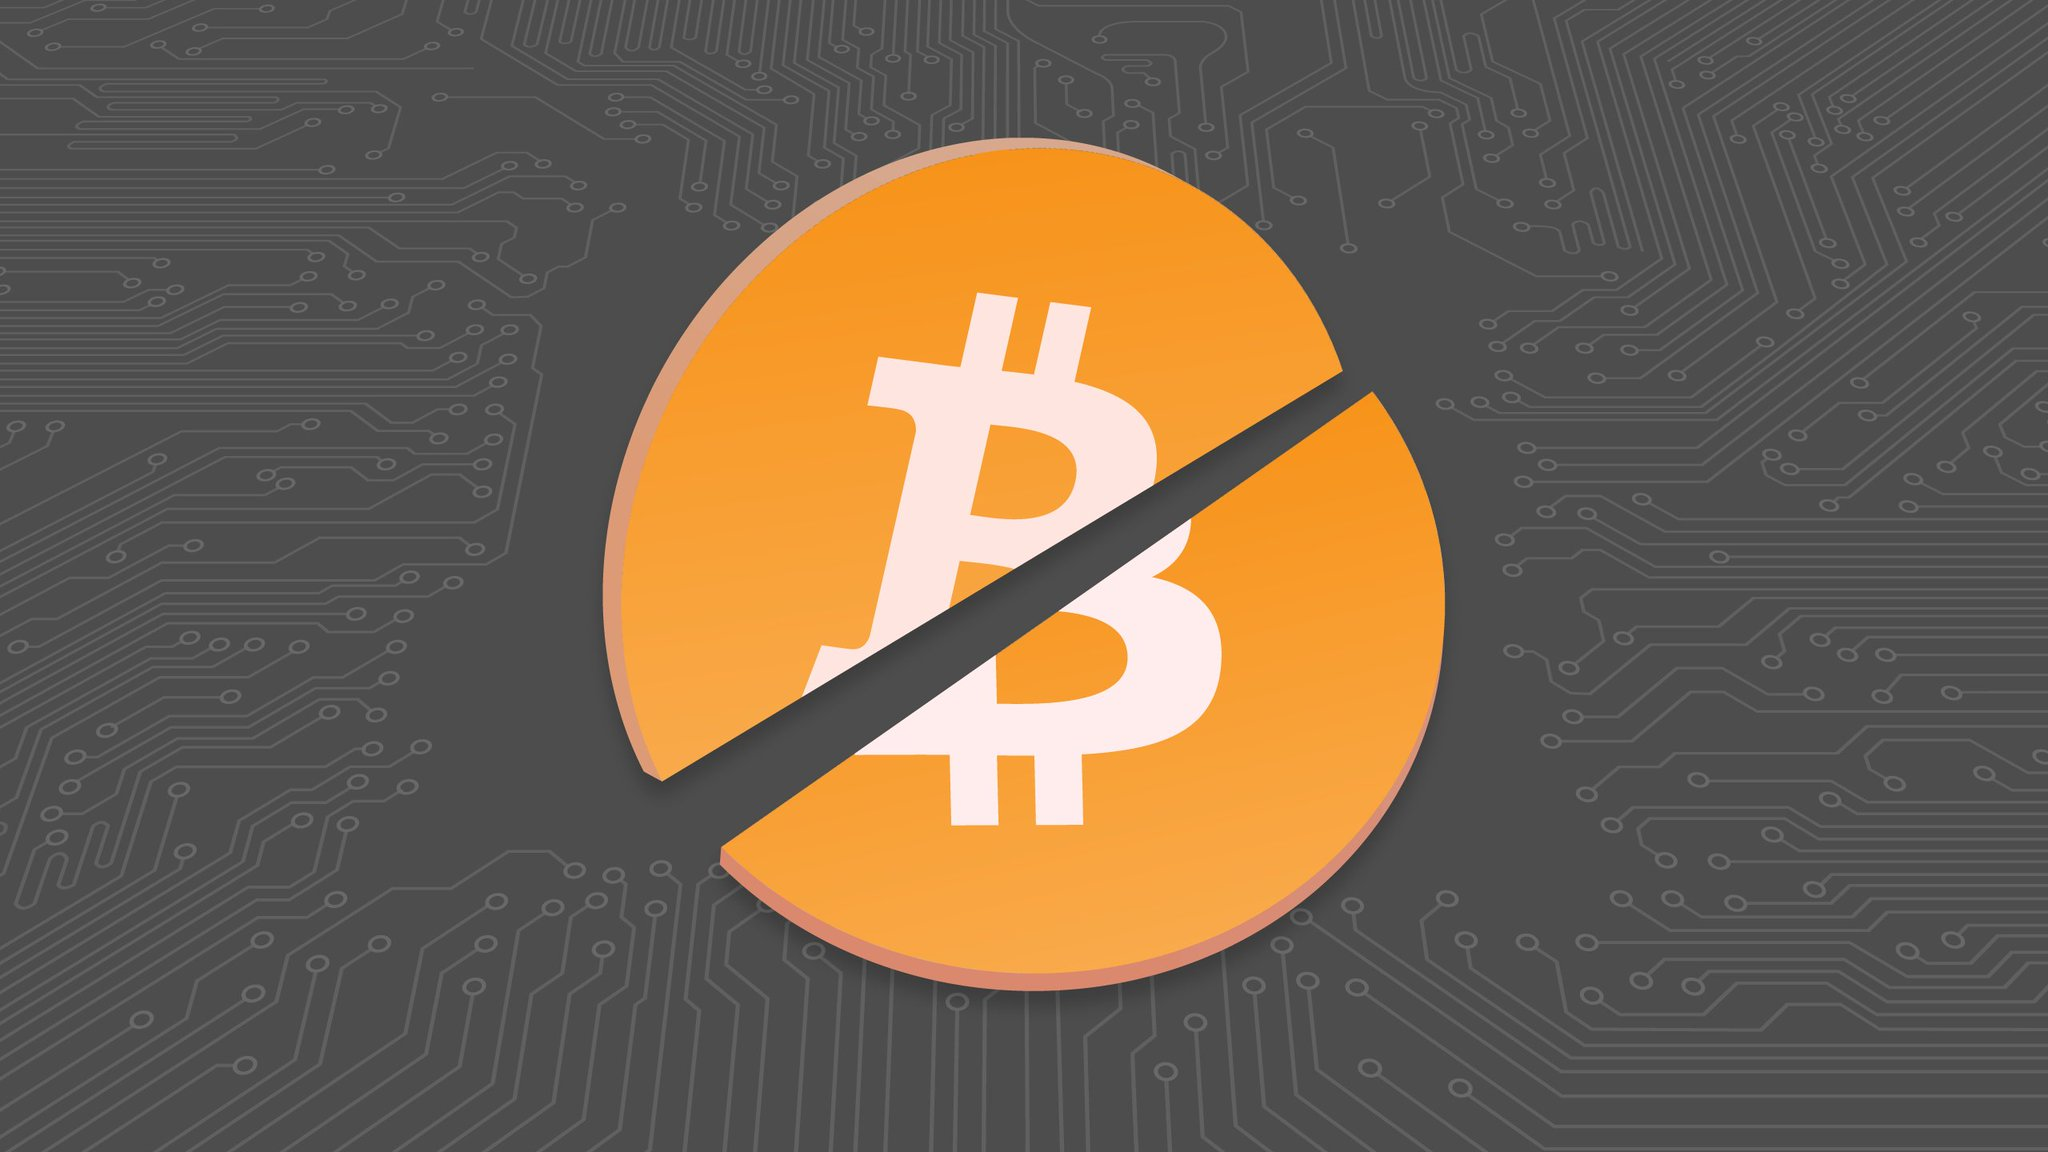 SegWit2x backers cancel plans for bitcoin hard fork https://t.co/fGQxRfHTIU by @romaindillet https://t.co/uDqBENxyE1